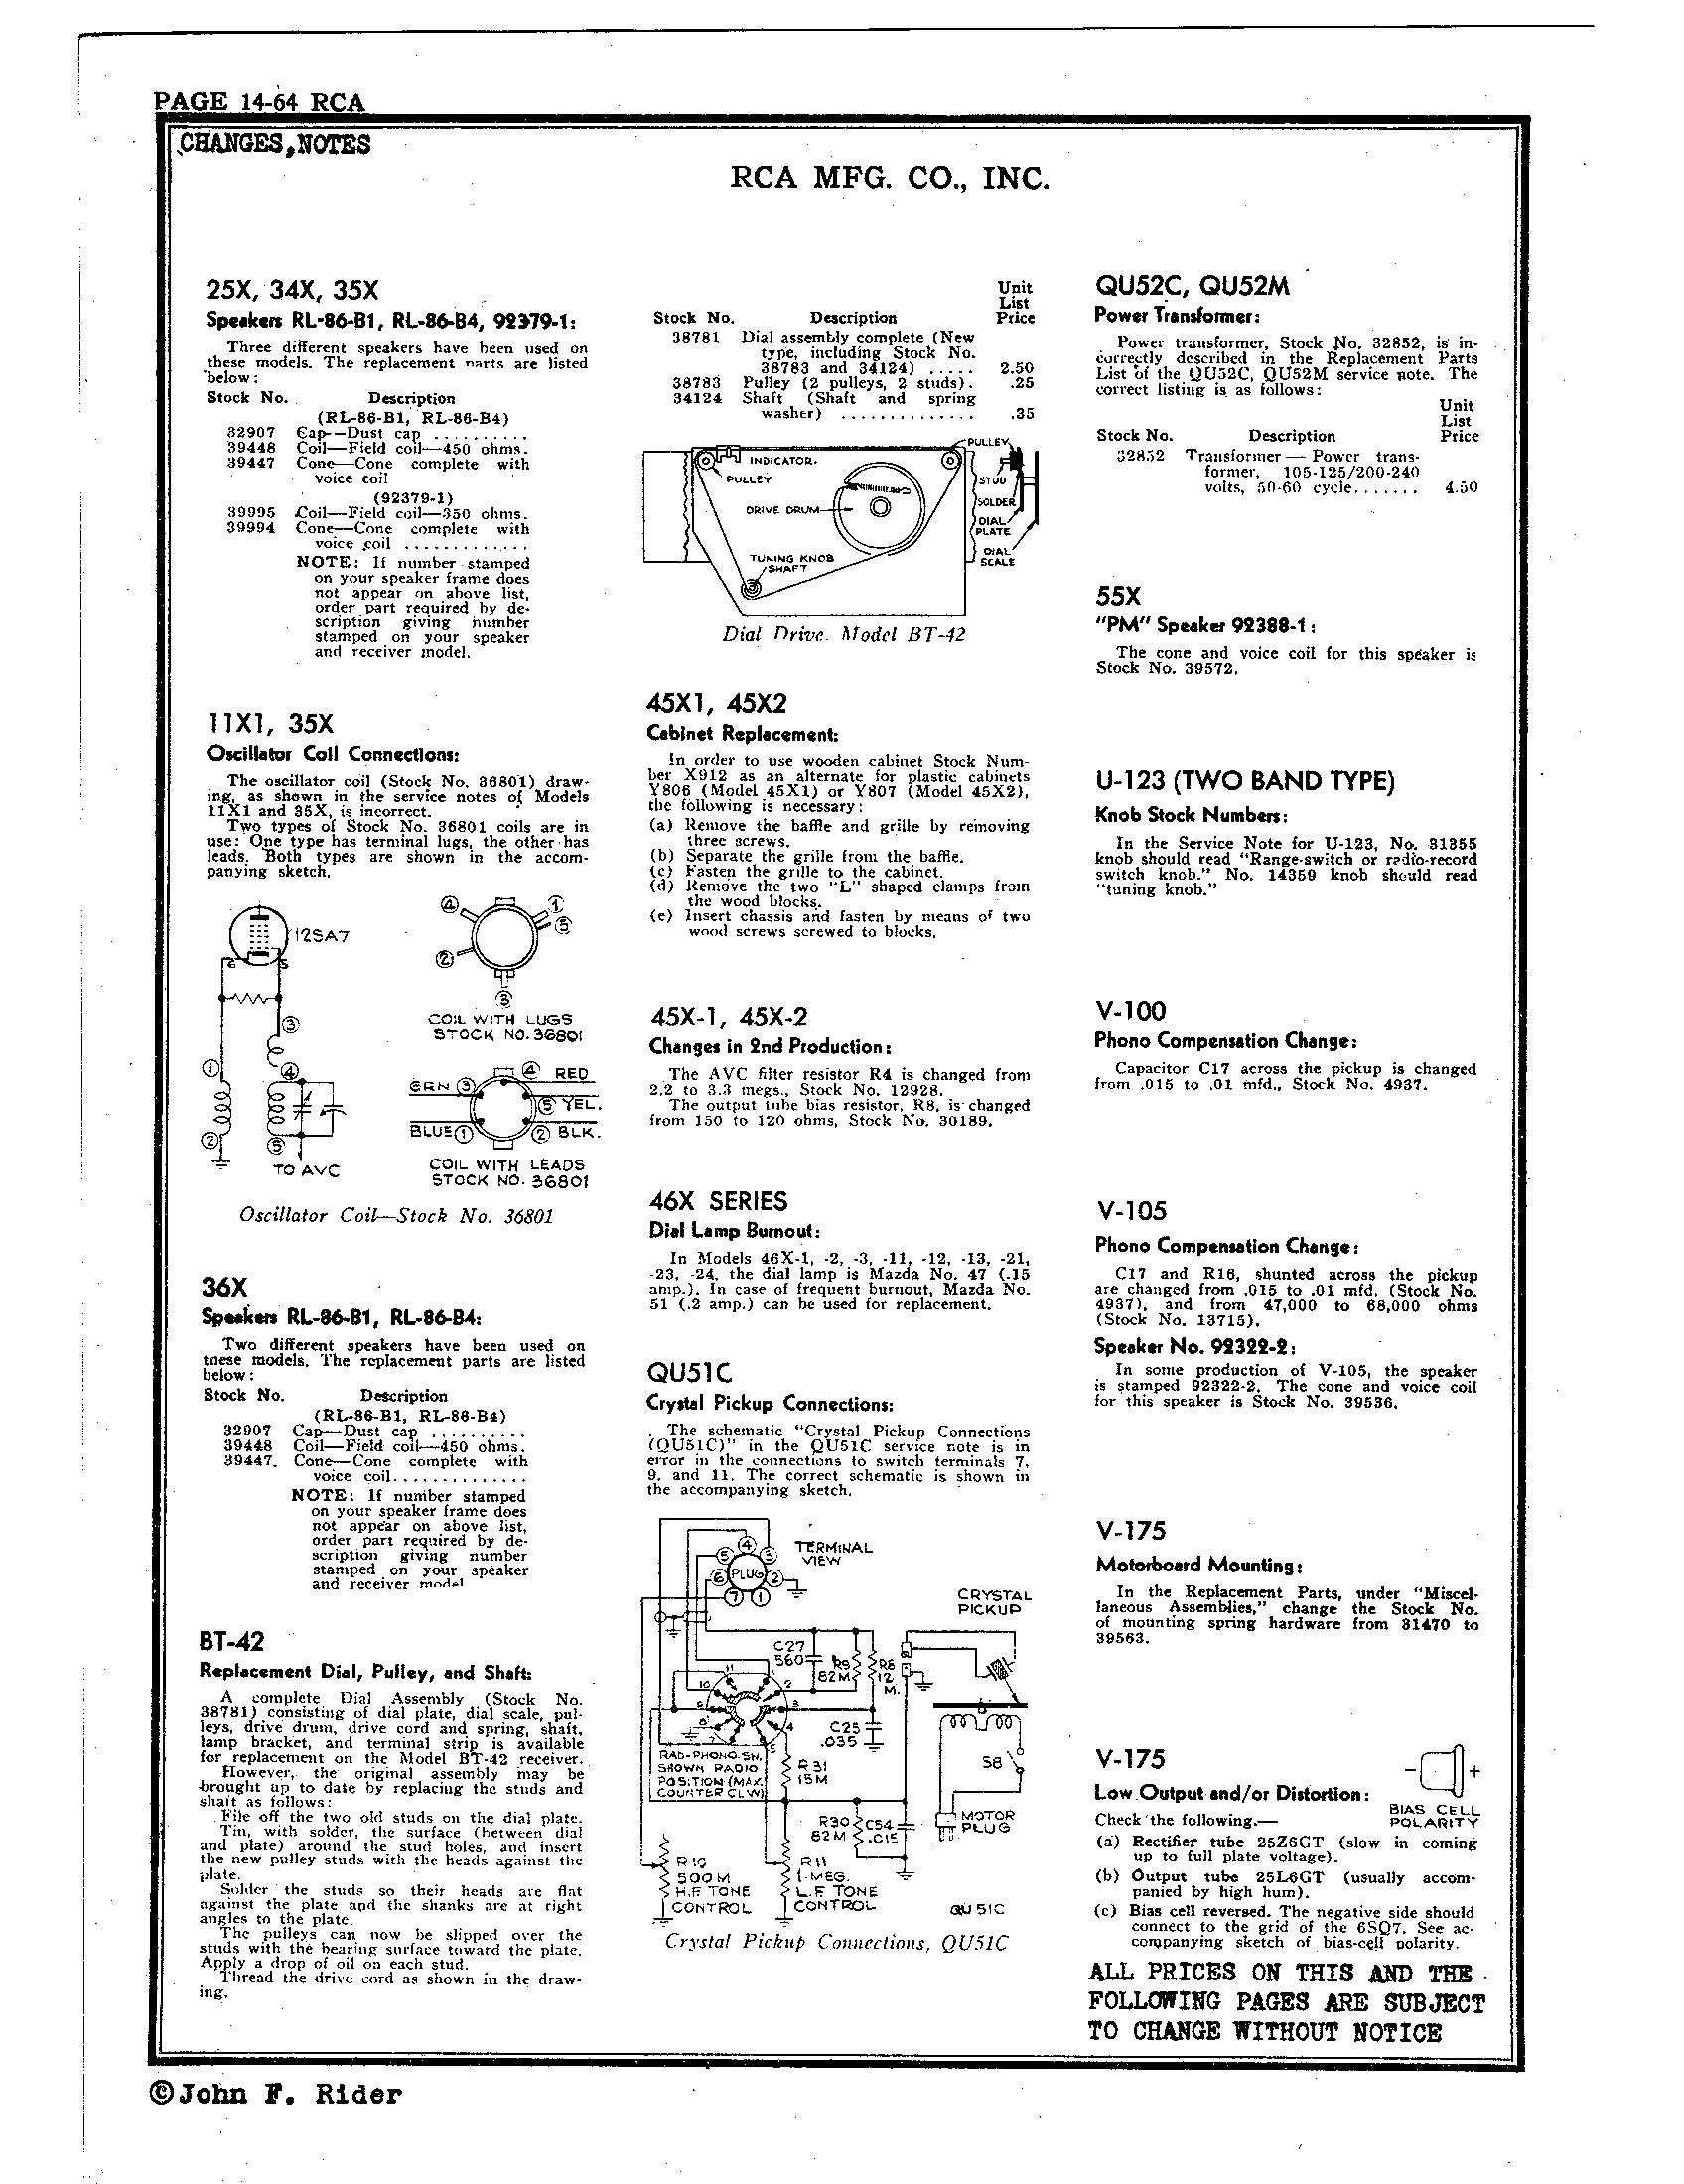 RCA Victor Co., Inc. 55X Schematic